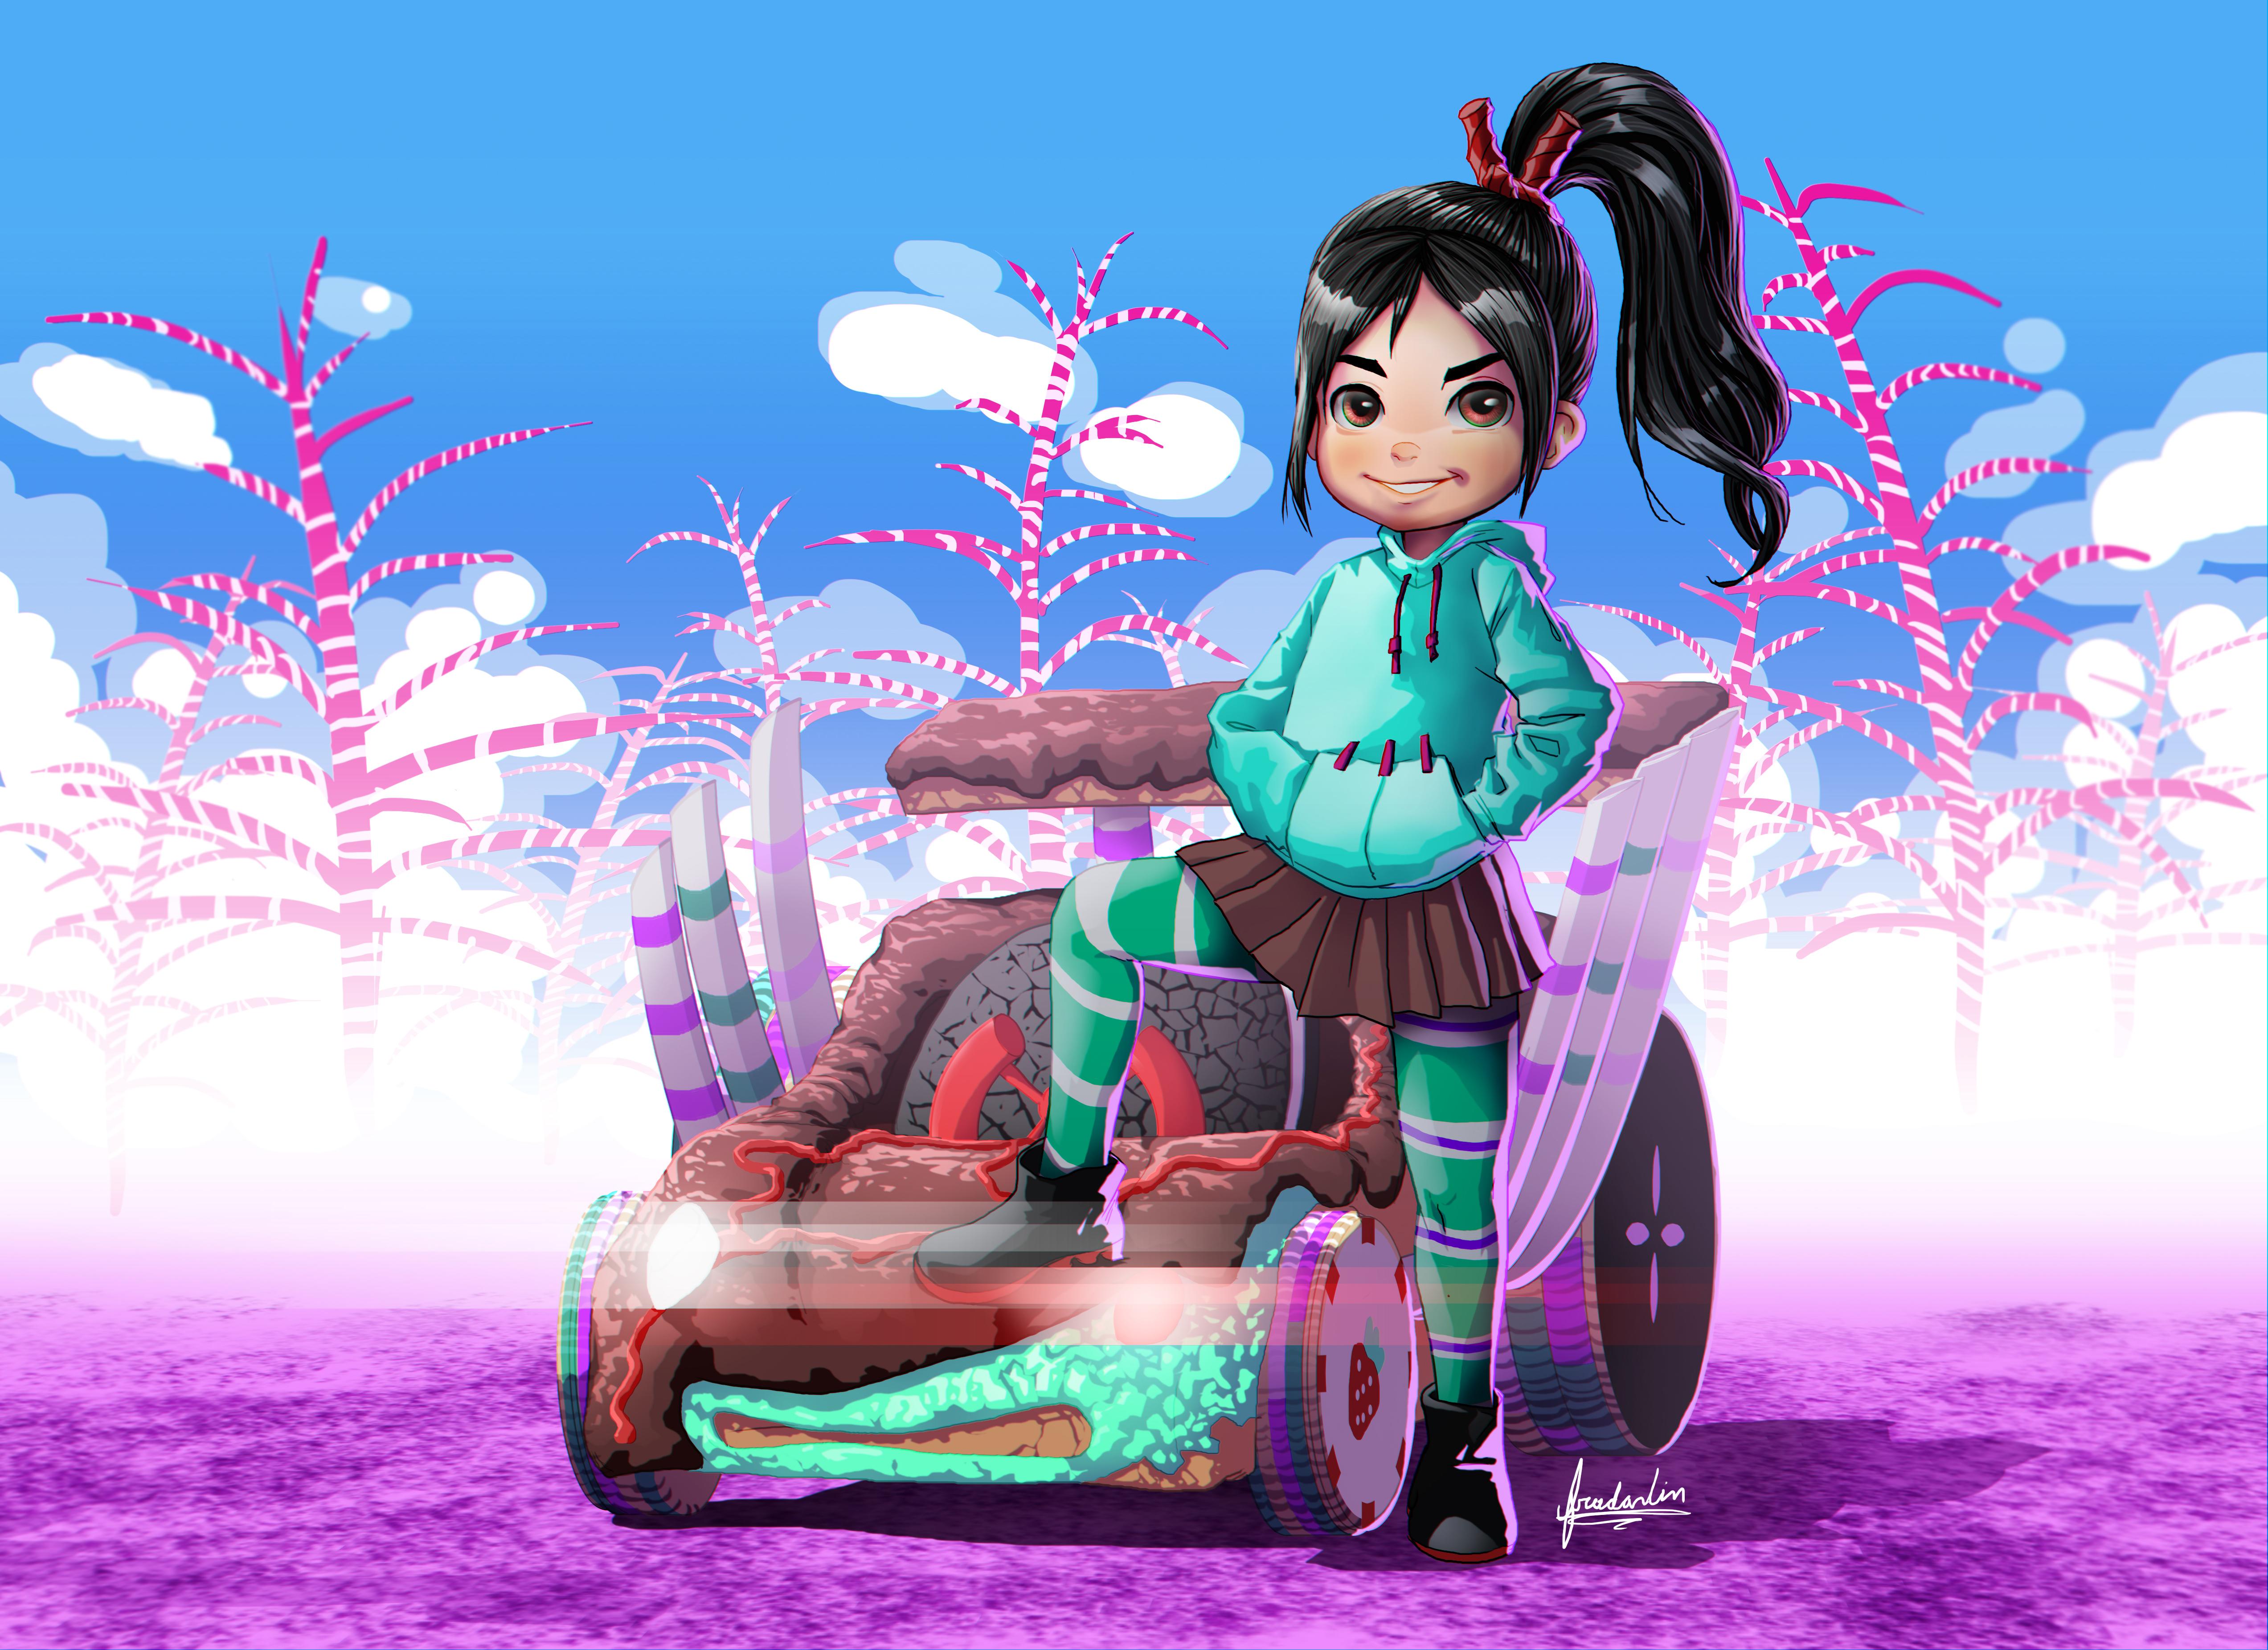 Wreck It Ralph Animation Movie 4k Hd Desktop Wallpaper For: Vanellope Von Schweetz Fan Art, HD Movies, 4k Wallpapers